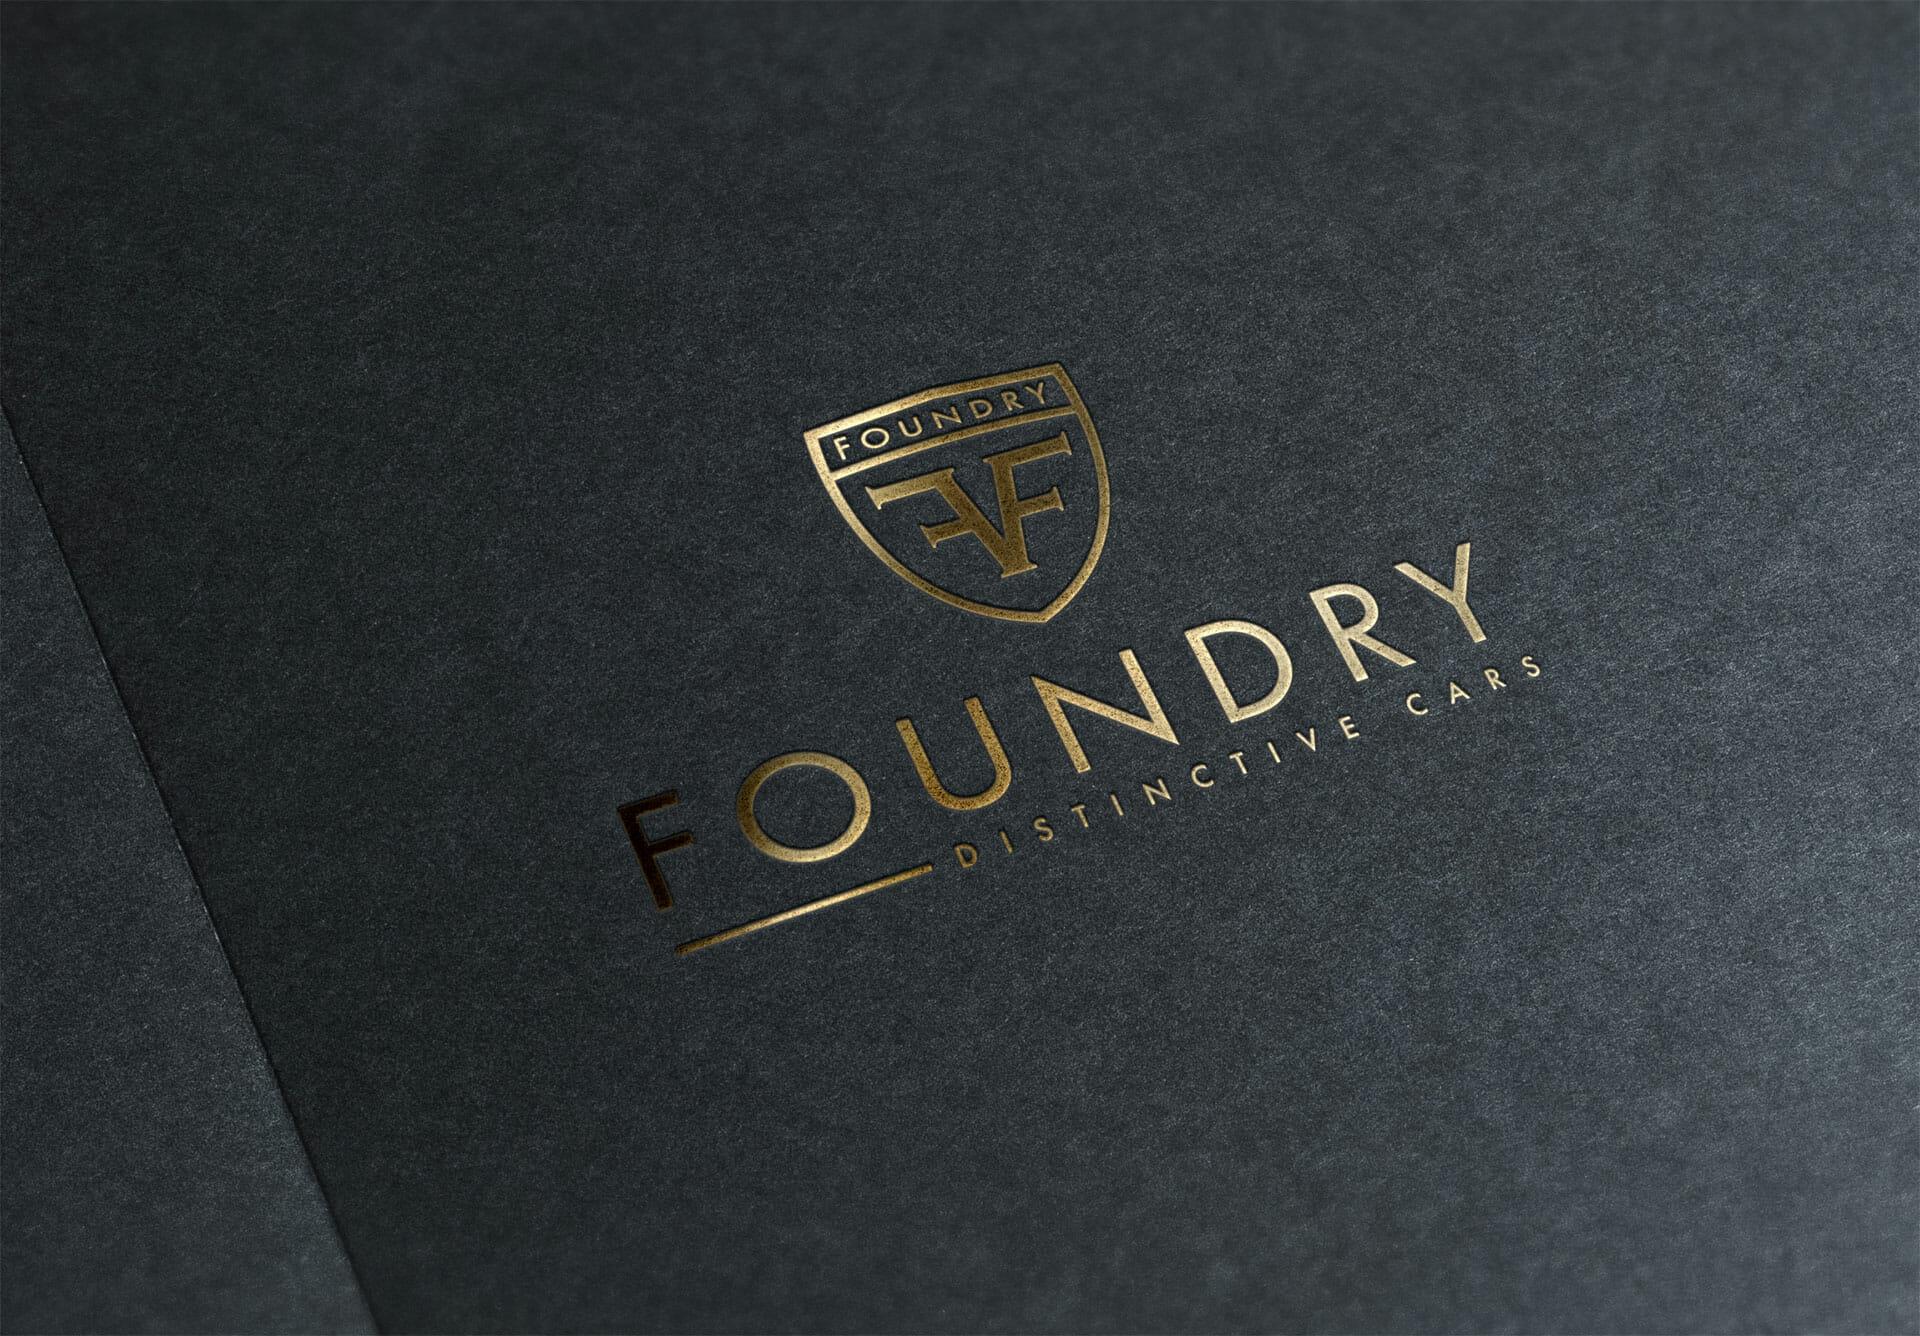 Foundry-Cars